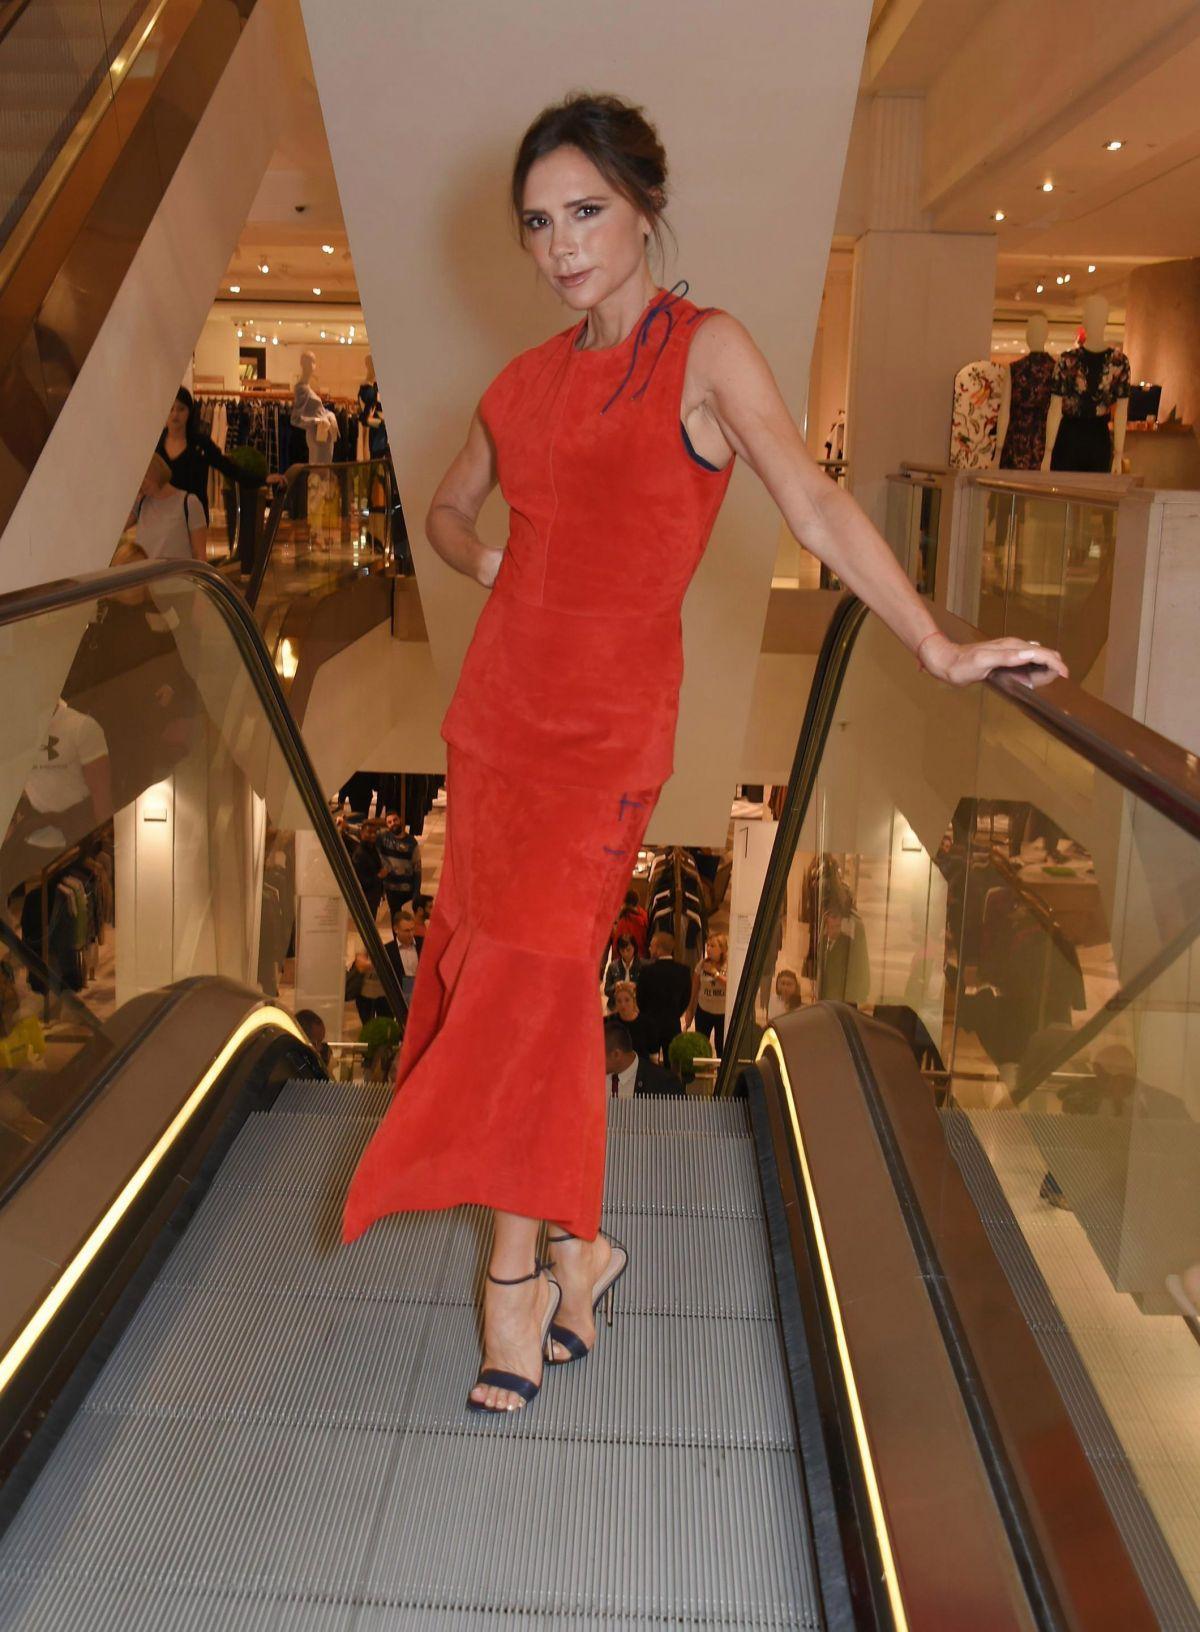 VICTORIA BECKHAM at Estee Lauder Make-up Launch in London 09/05/2017